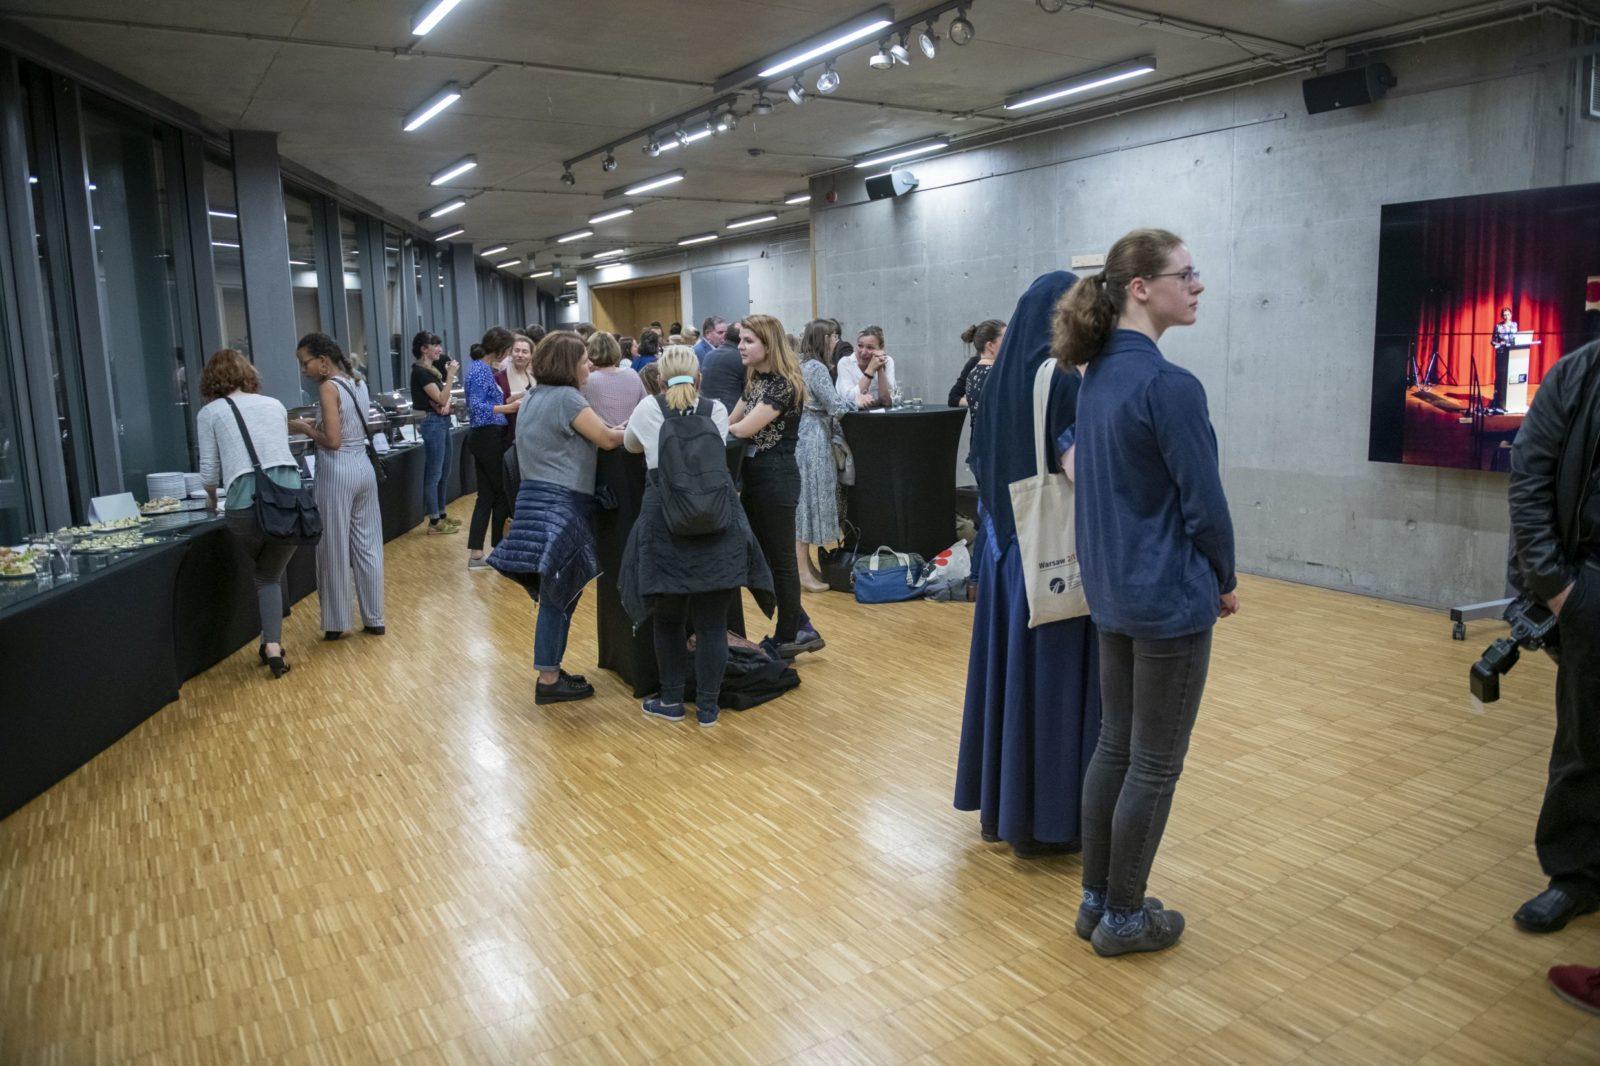 Warschau_2019_Empfang_reception_Thursday_Warsaw_Stasiuk_Konrad_140